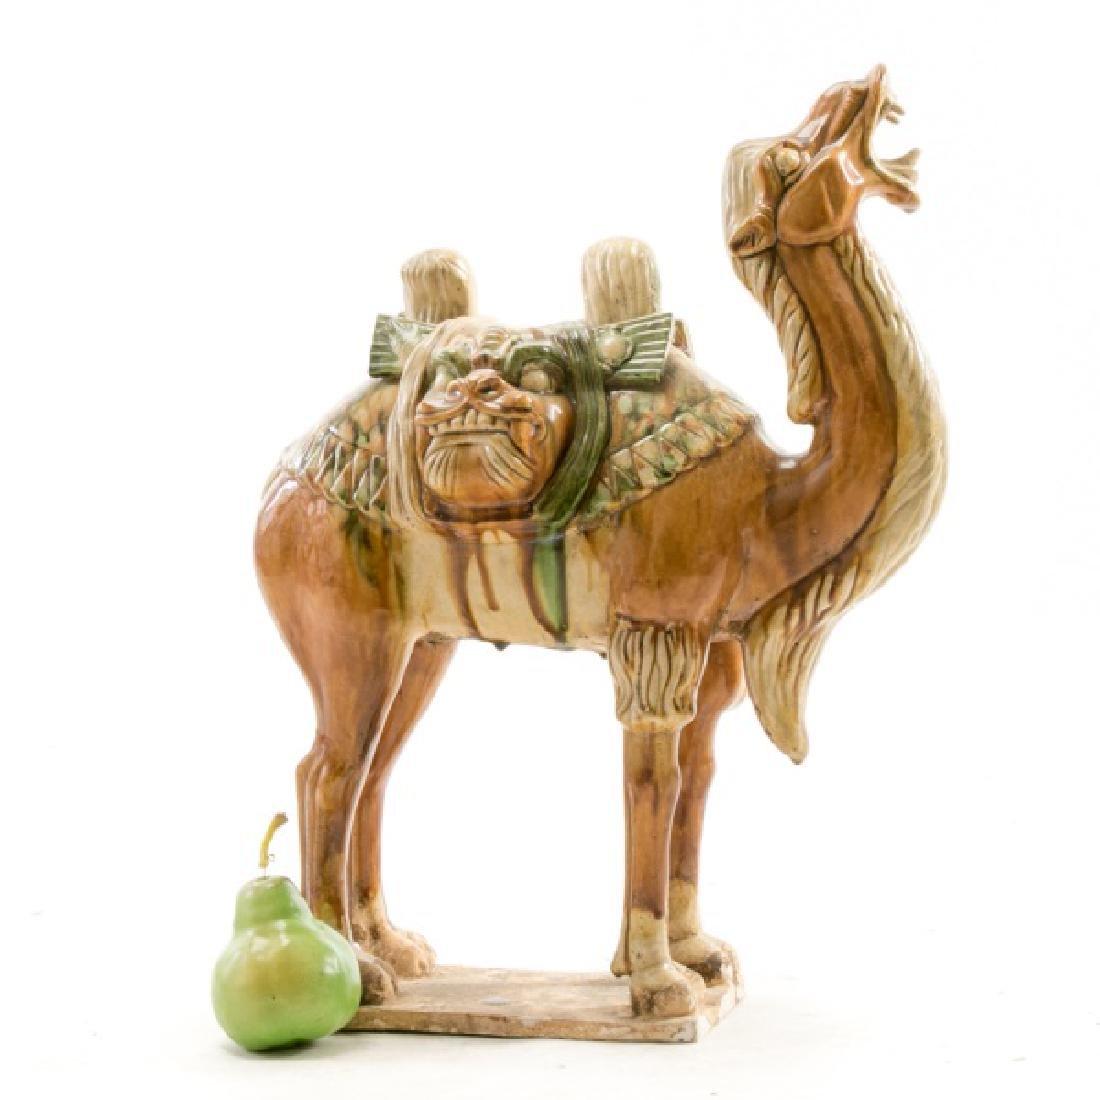 Tang Dynasty Style Sancai Glazed Bactrian Camel - 2